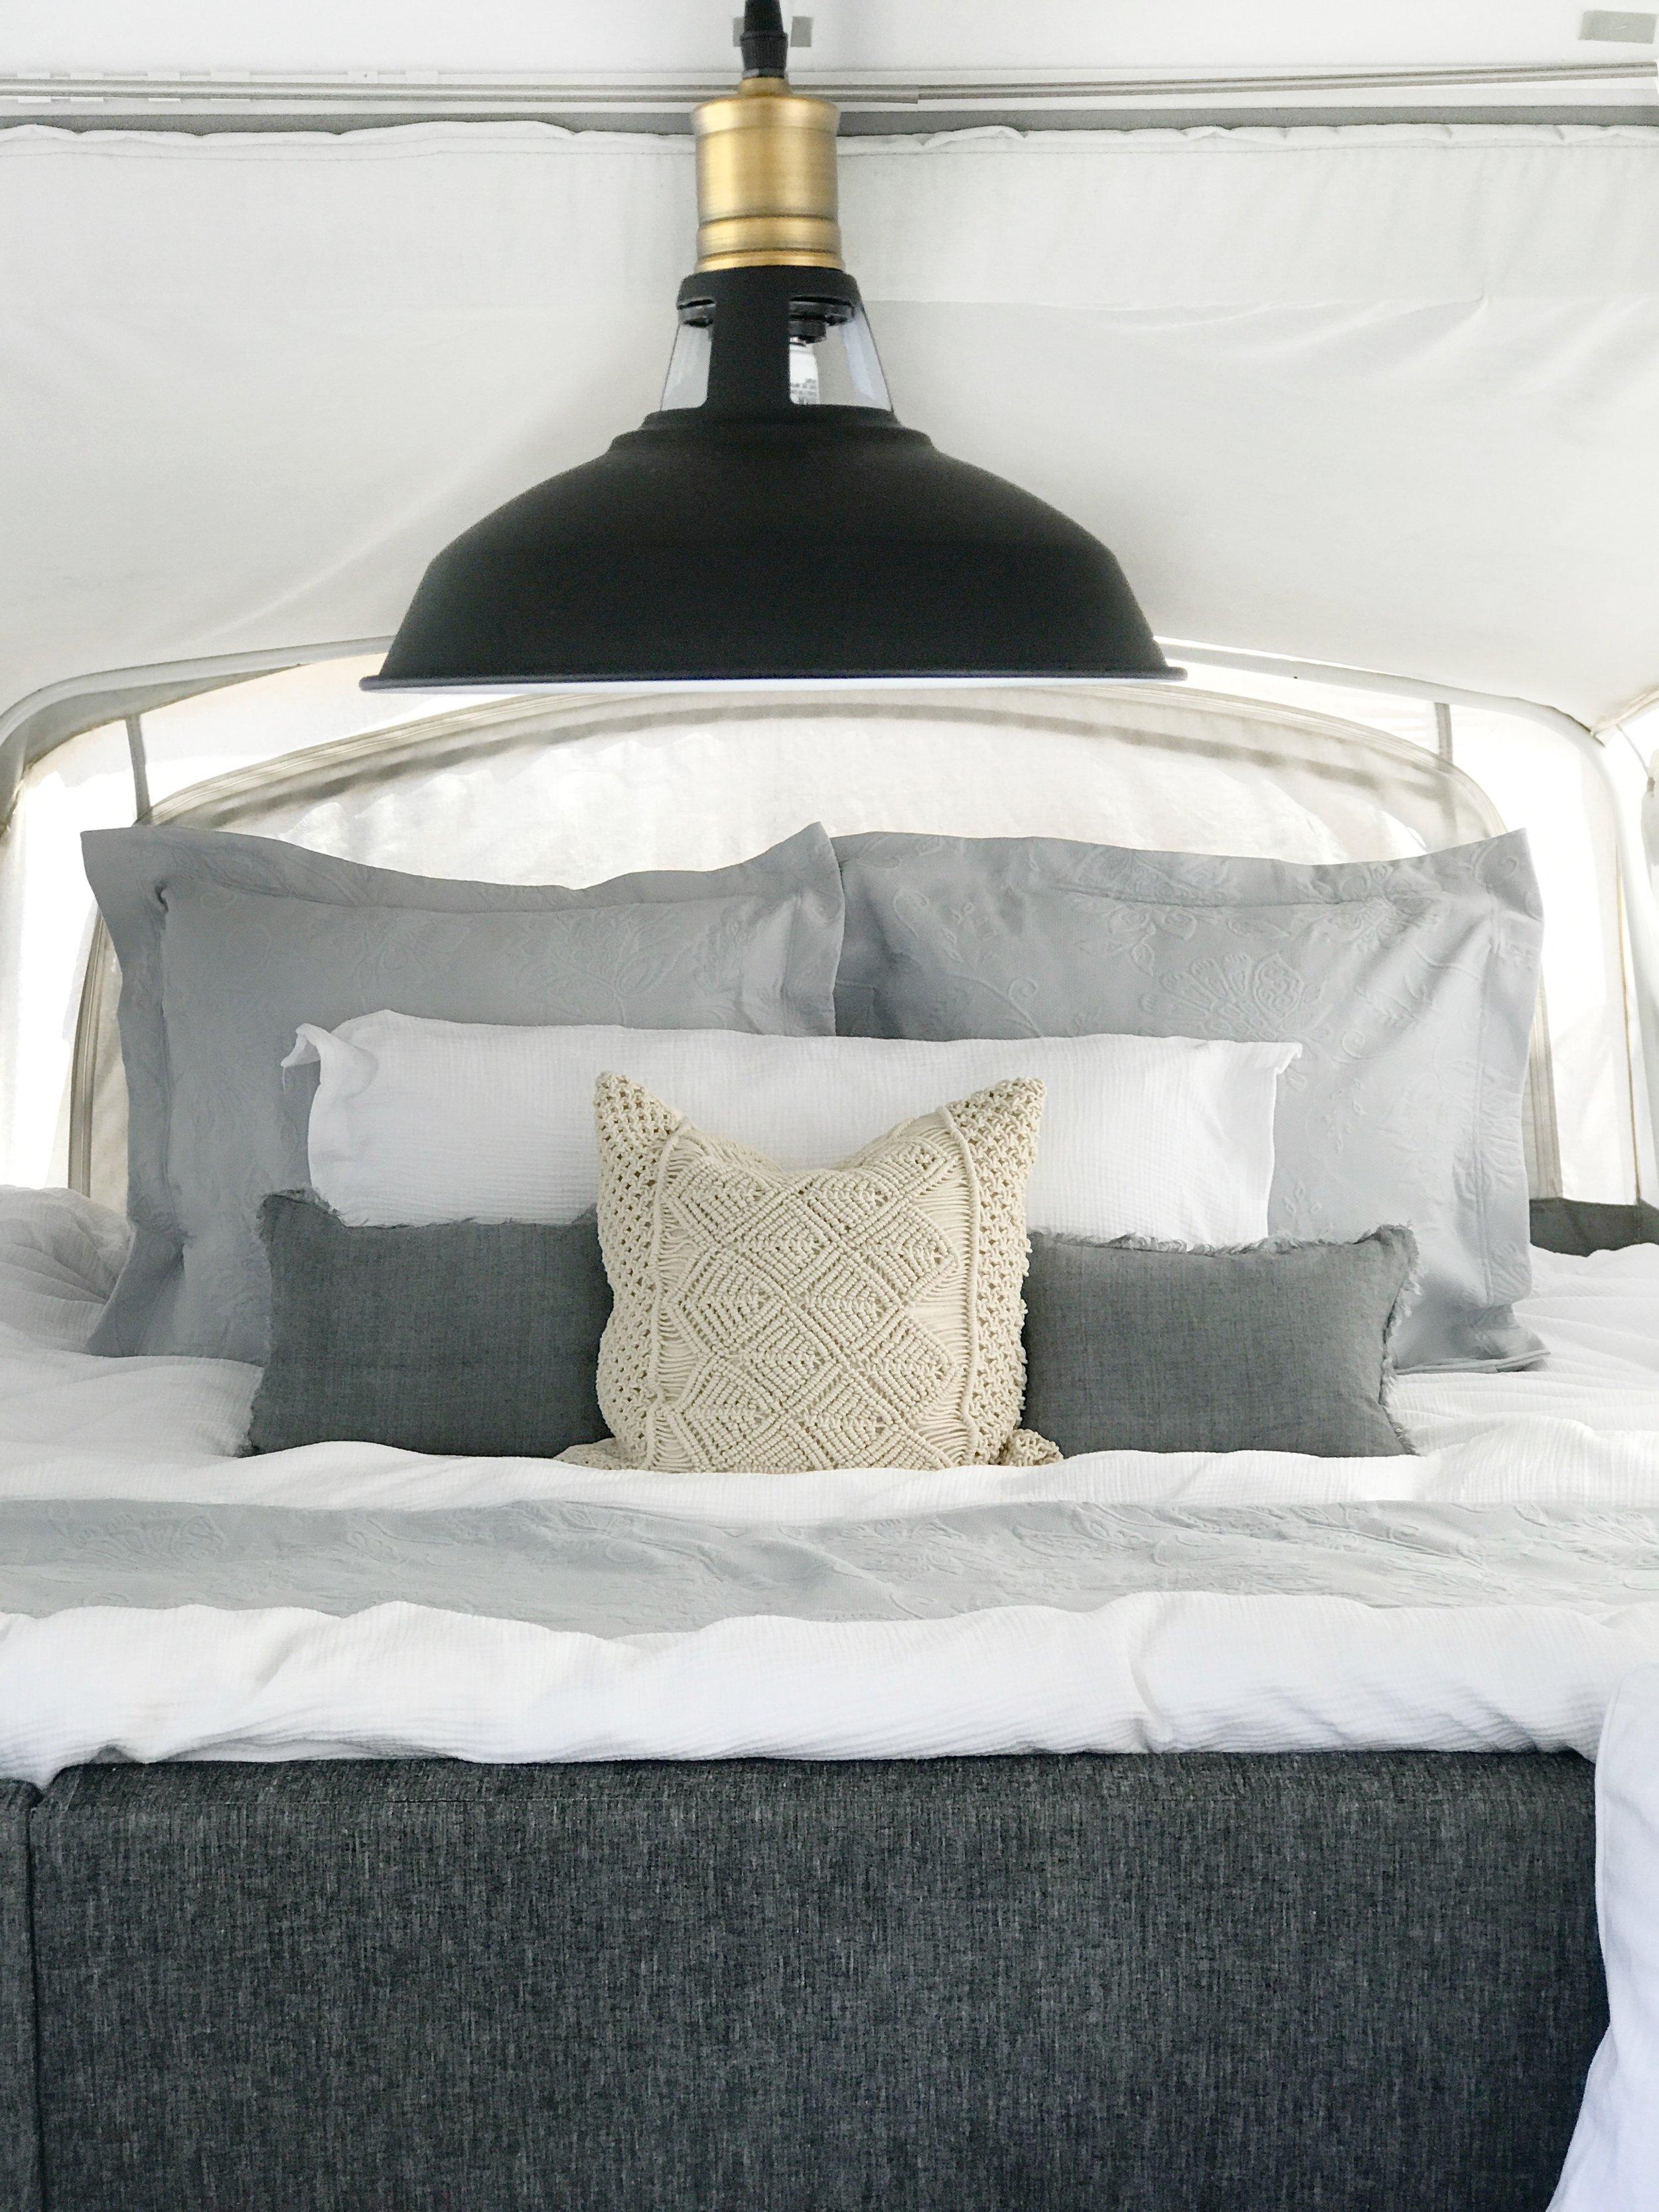 Pop Up Camper Remodel Dreaming Of Homemaking